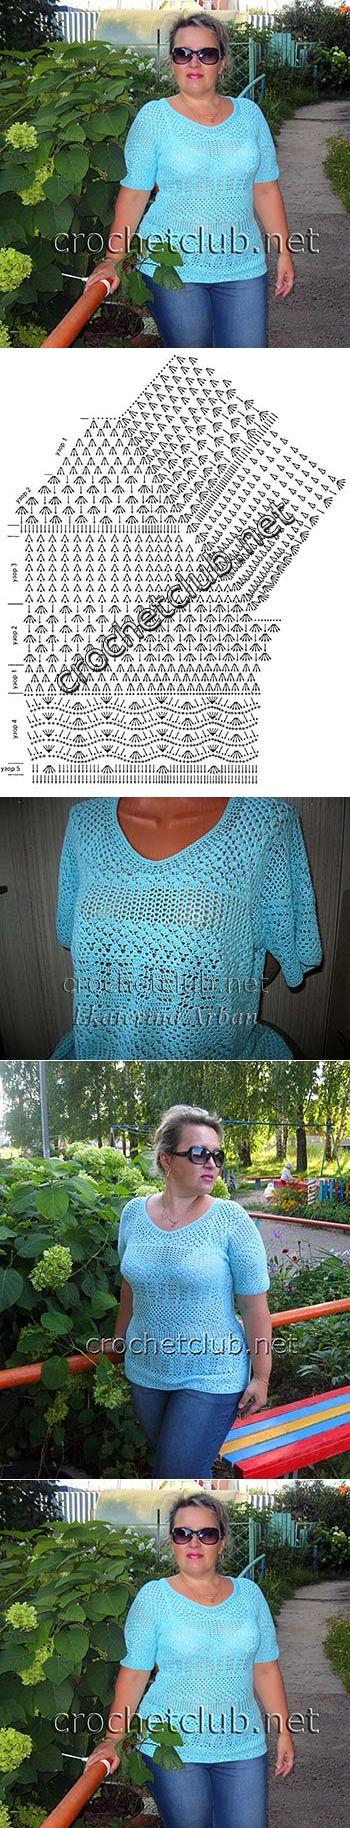 Бирюзовая футболка крючком - Вязание Крючком. Блог Настика